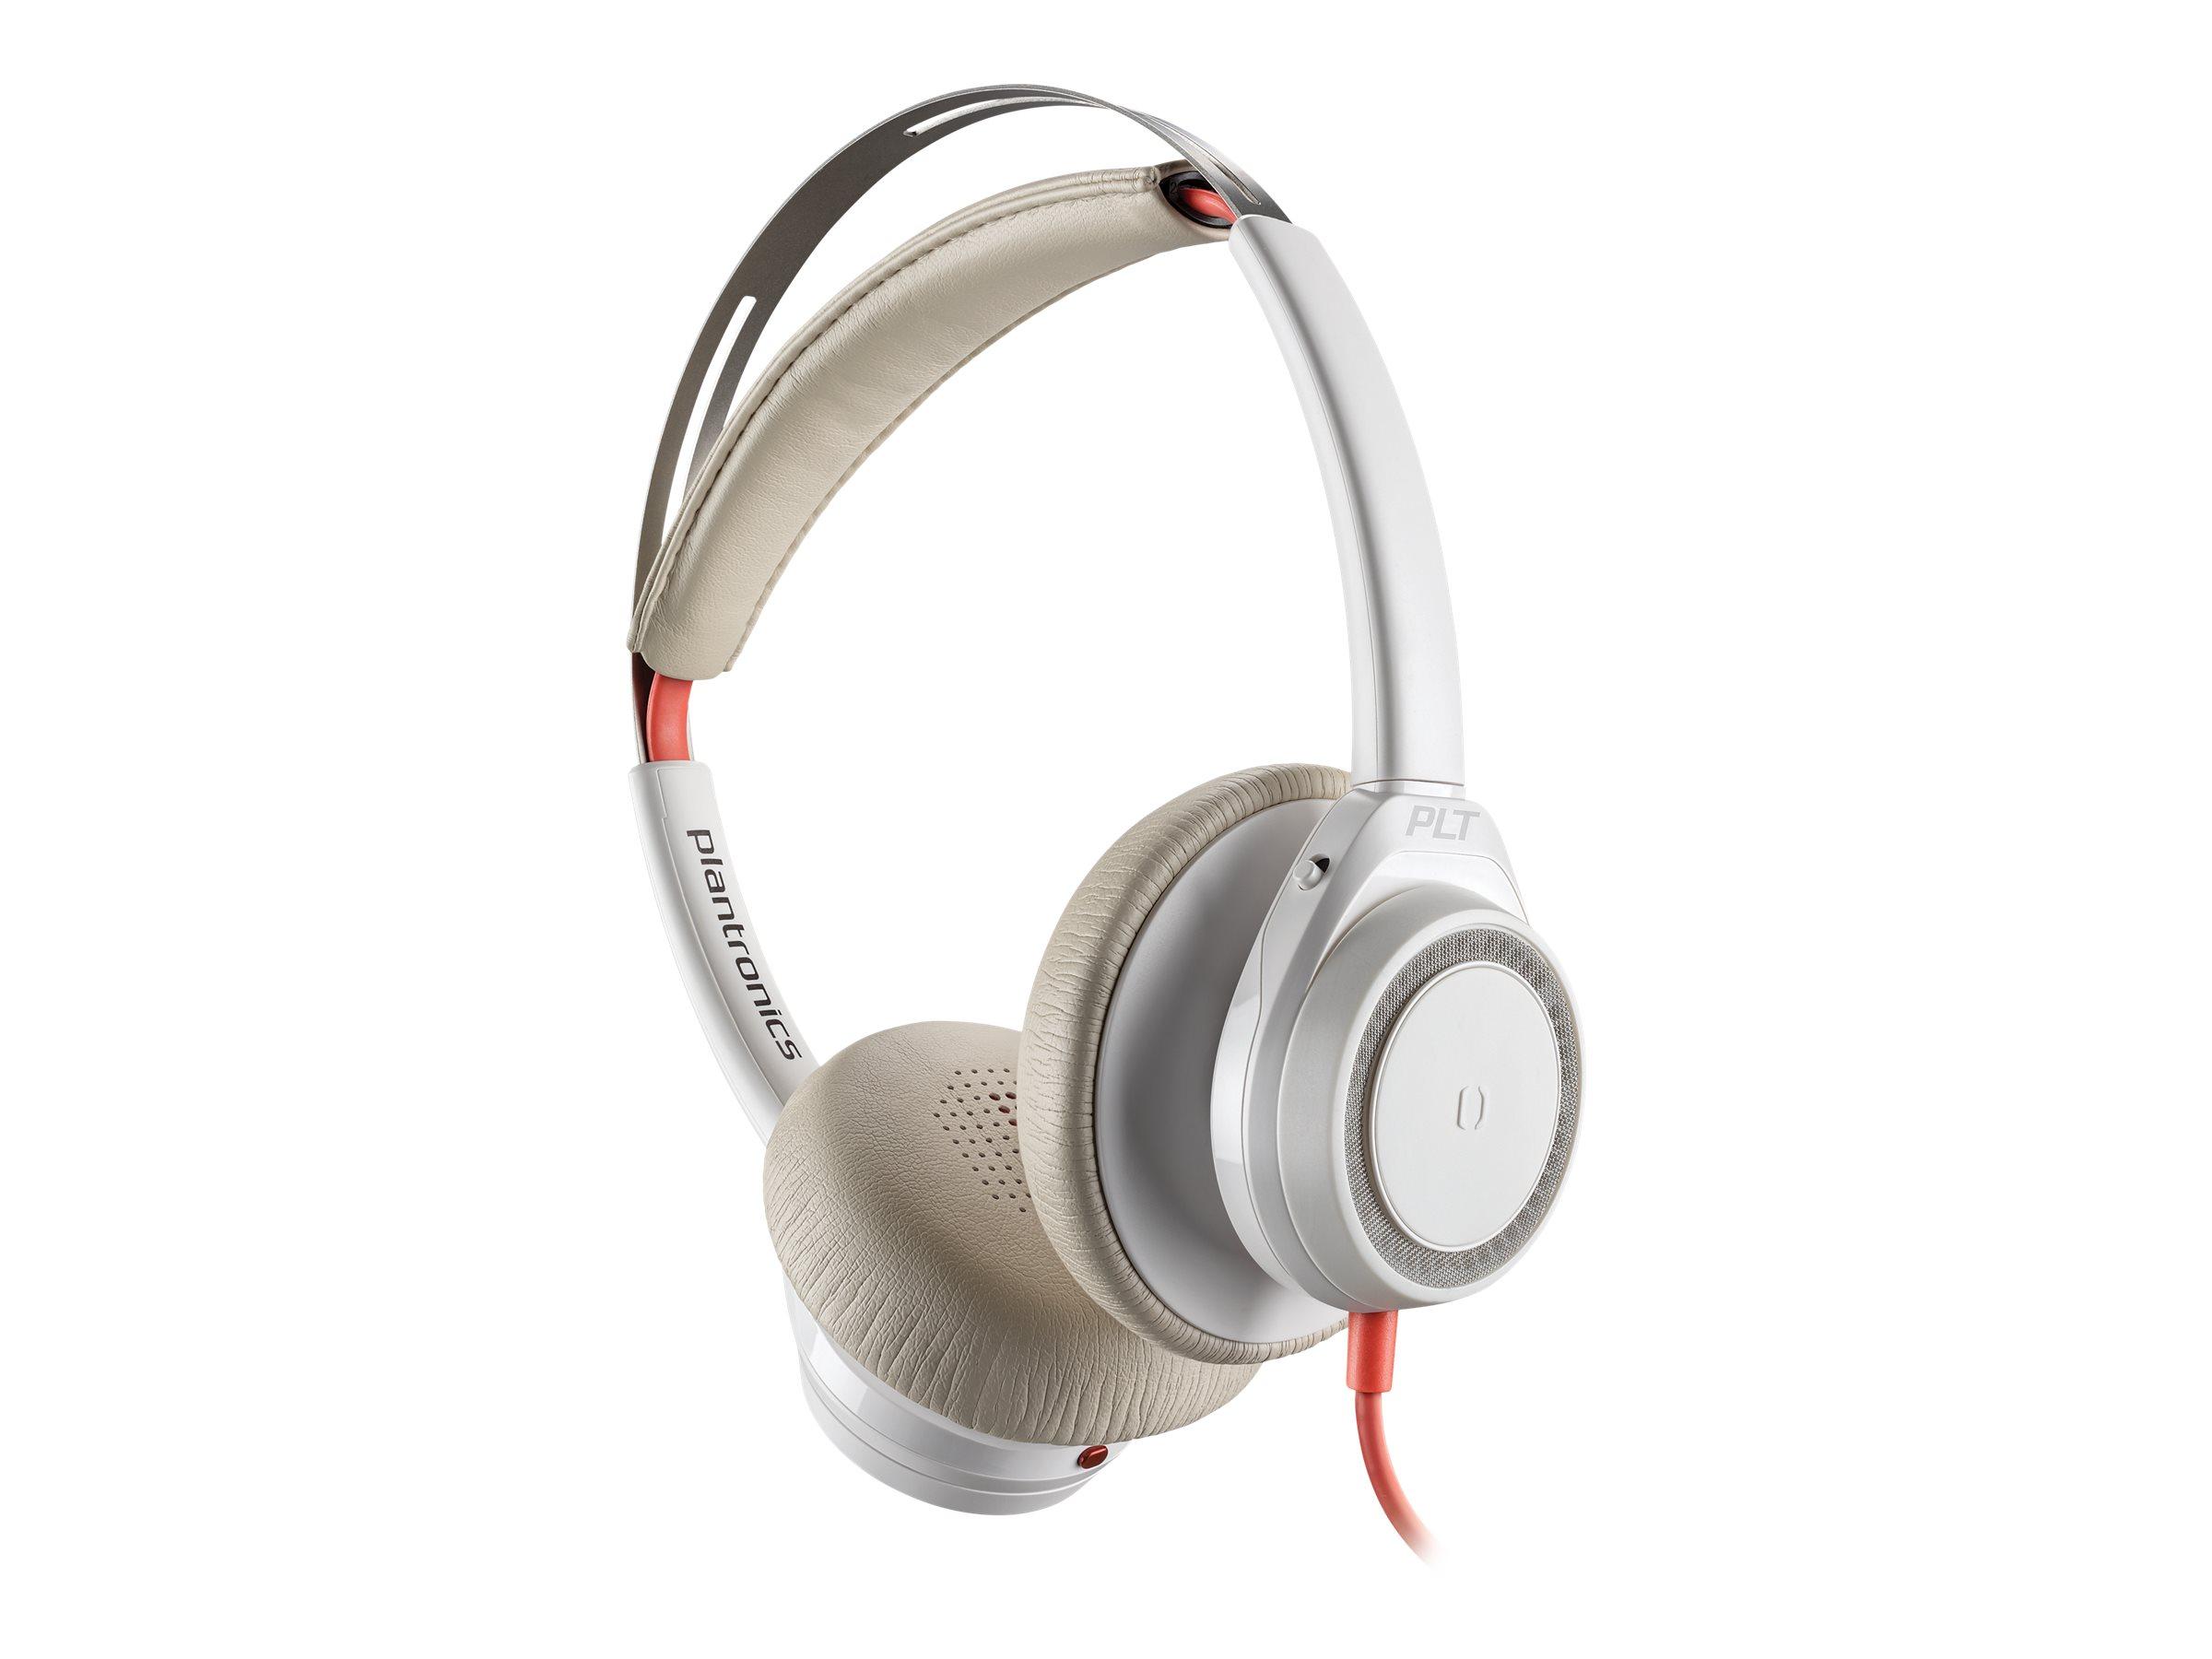 Poly - Plantronics Blackwire 7225 - Headset - On-Ear - kabelgebunden - aktive Rauschunterdrückung